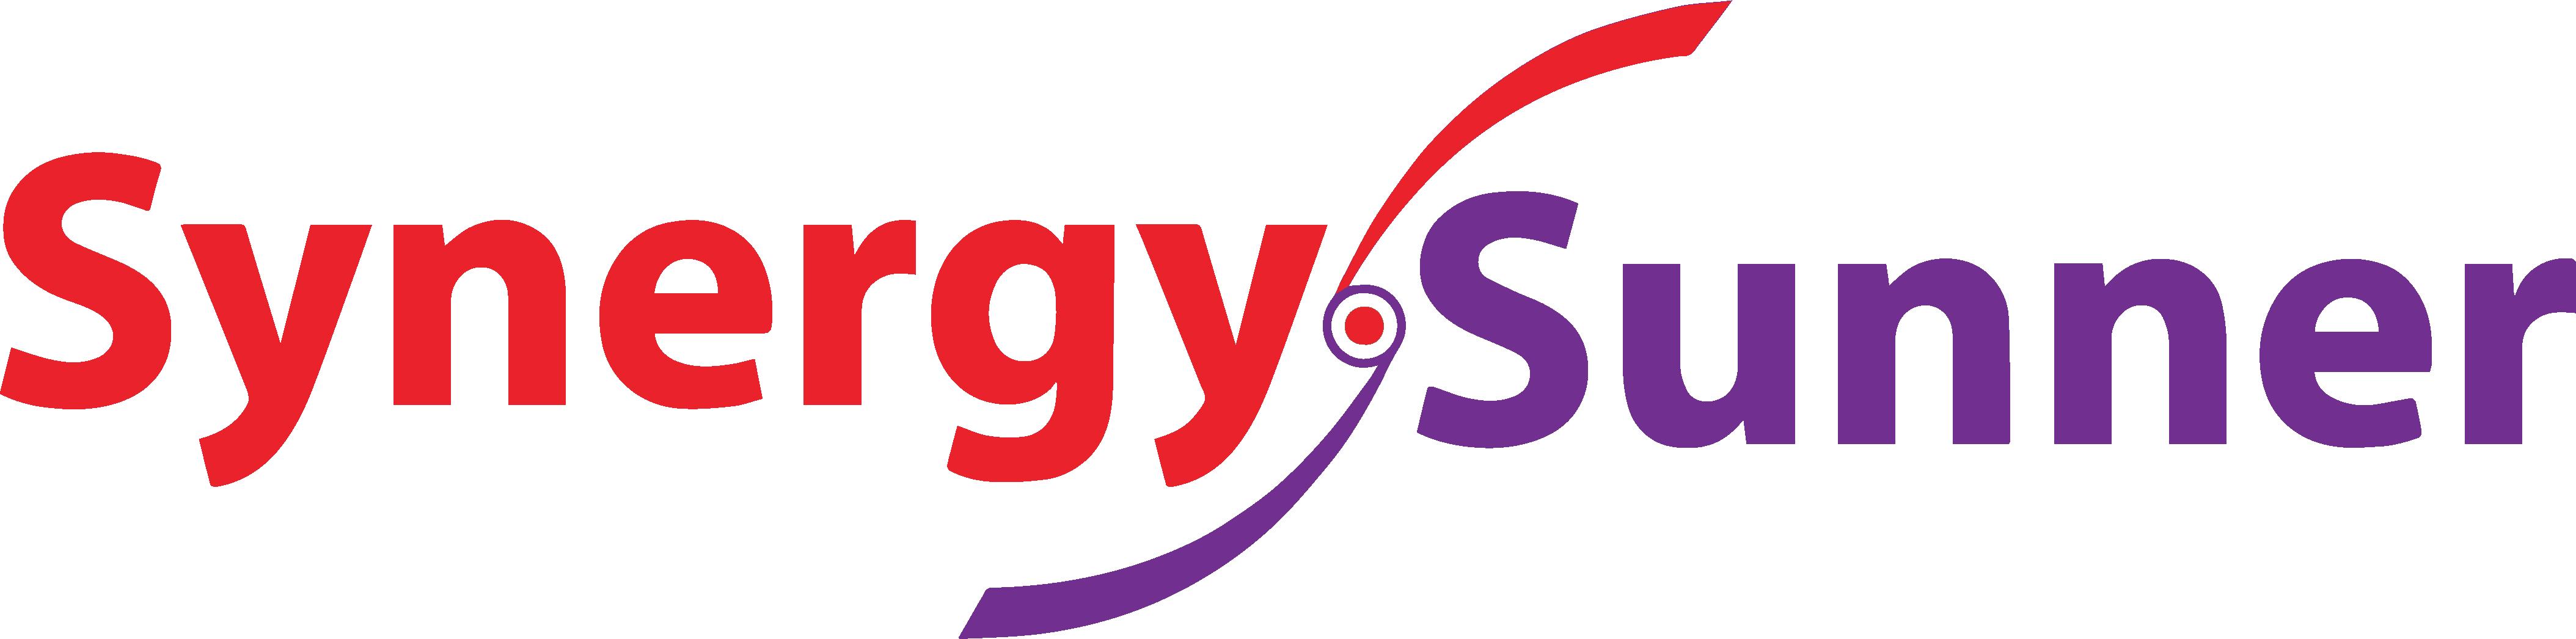 Synergy Print Sdn Bhd